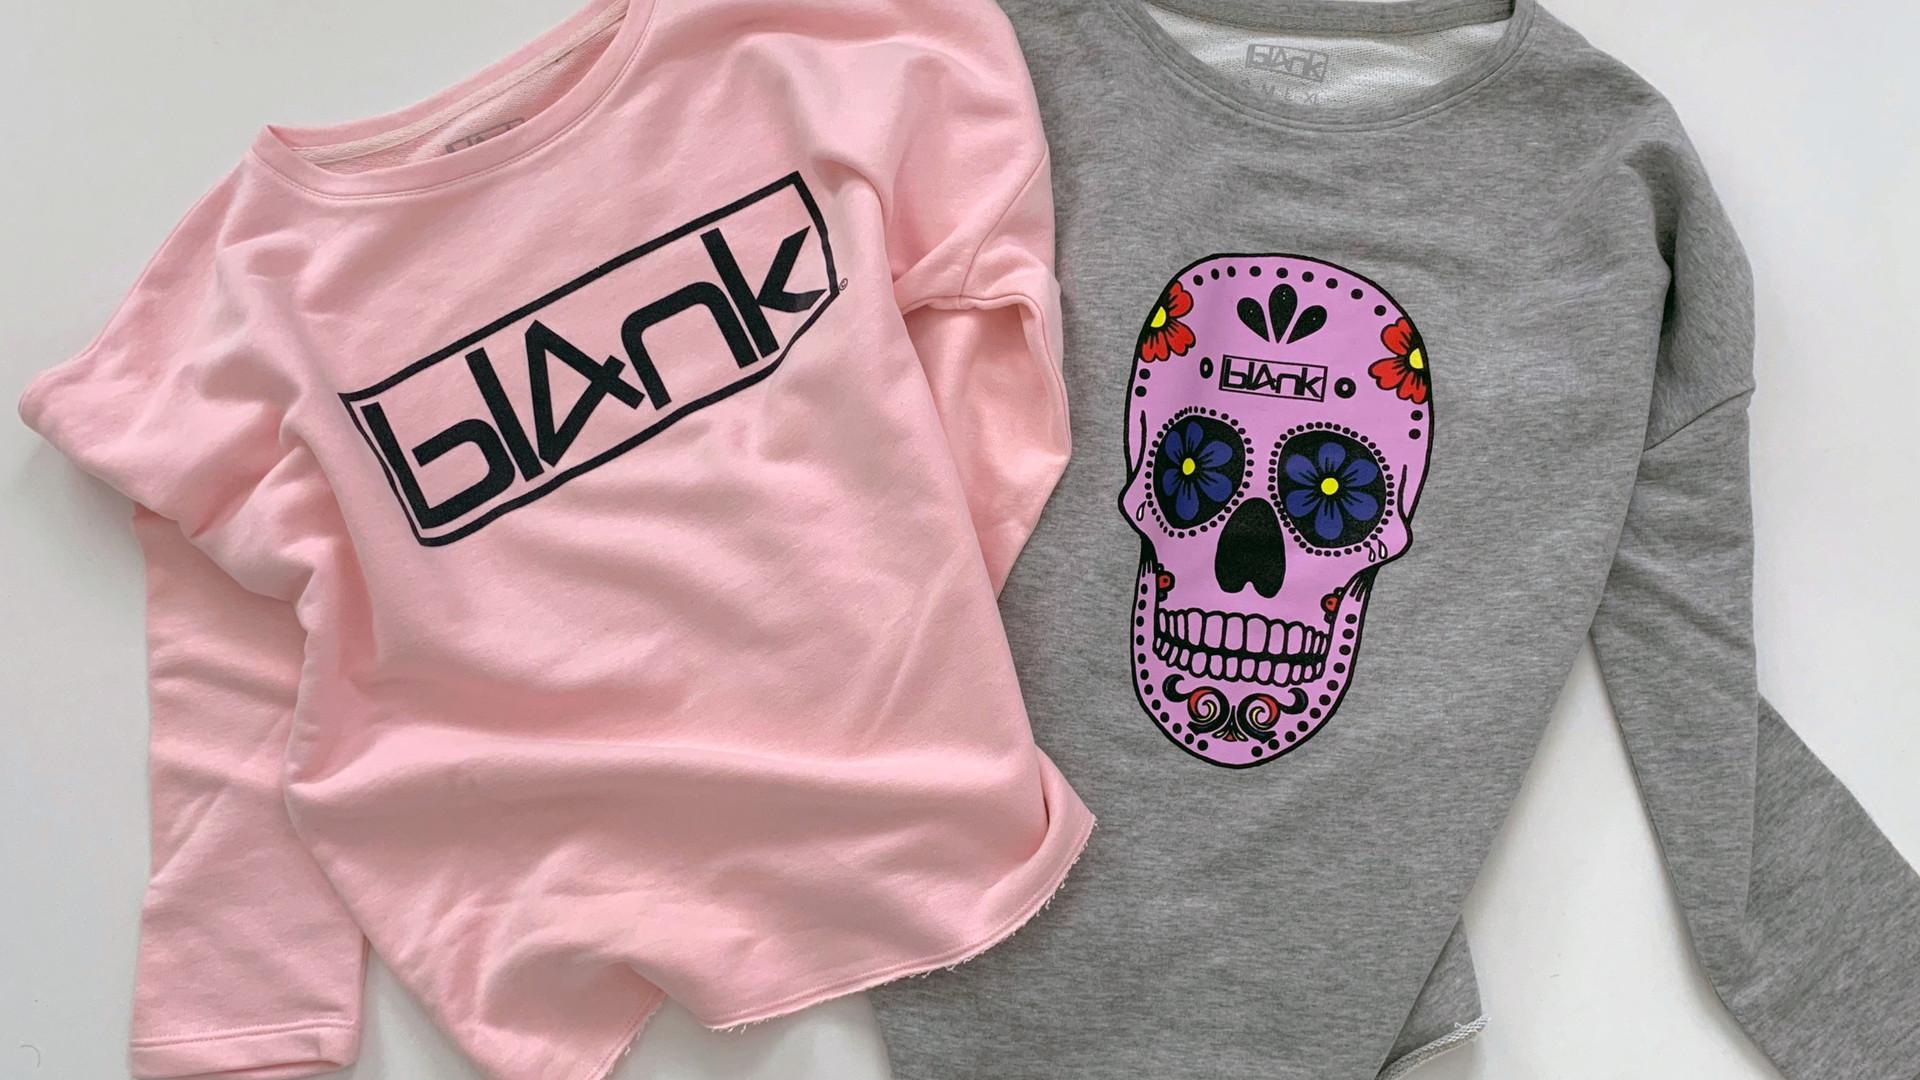 bl4nk womens sweatshirts